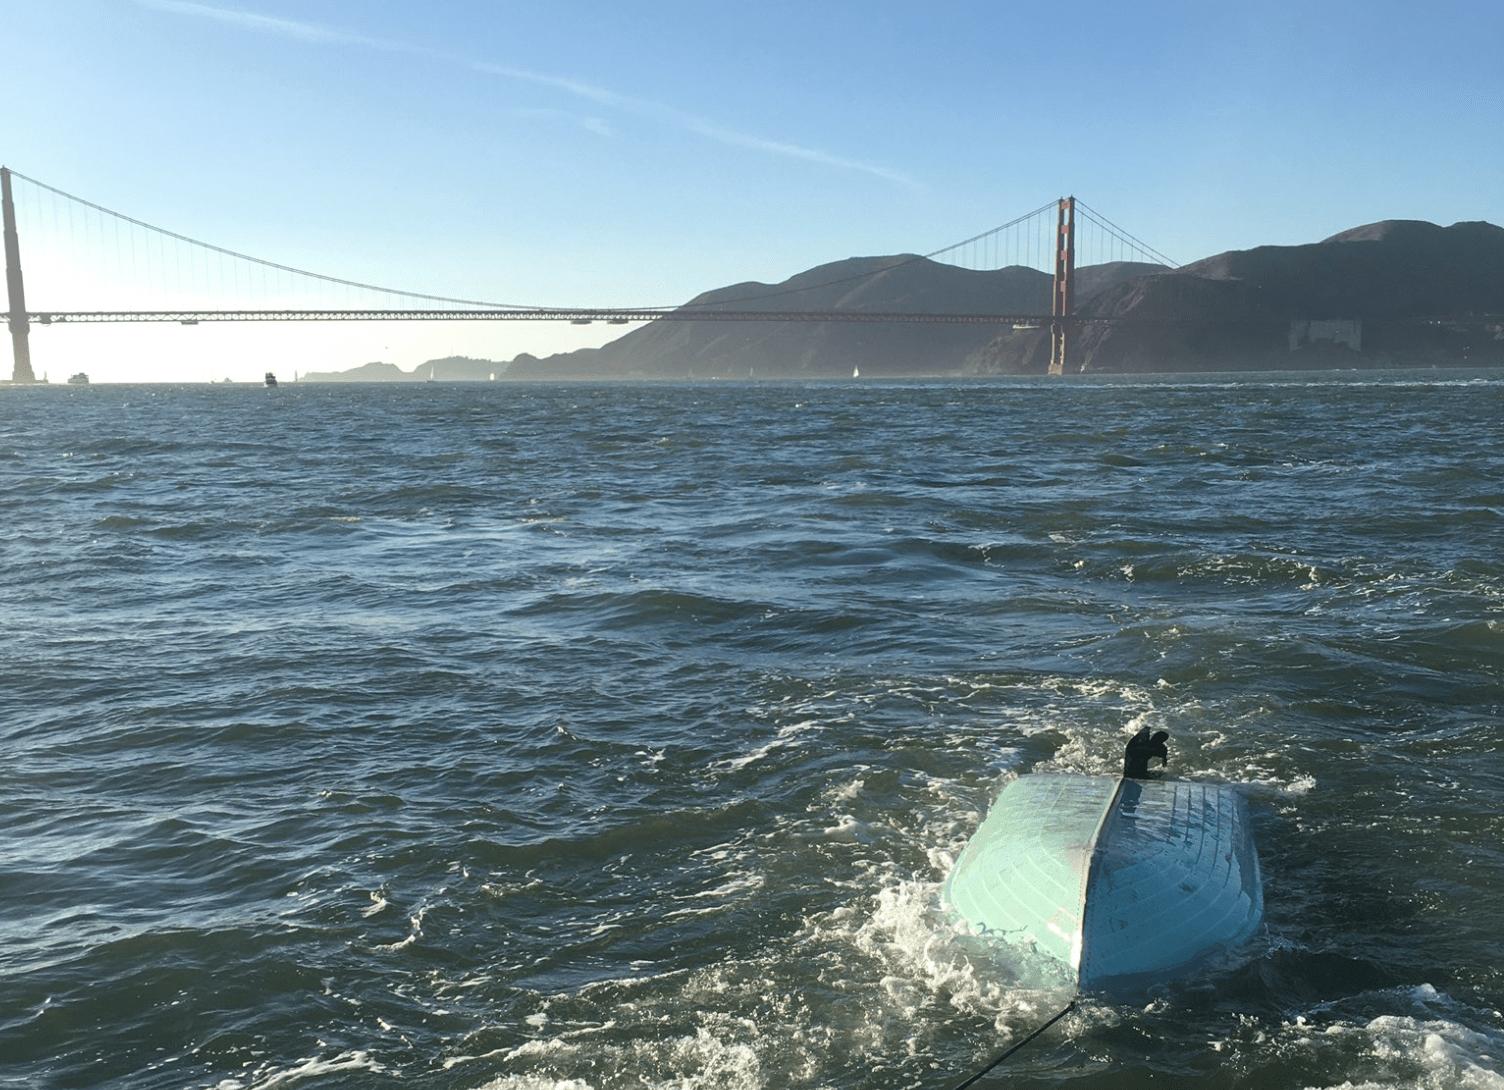 A 12-foot aluminum boat that capsized west of Alcatraz on Nov. 15, 2020. (SFPD/Twitter)